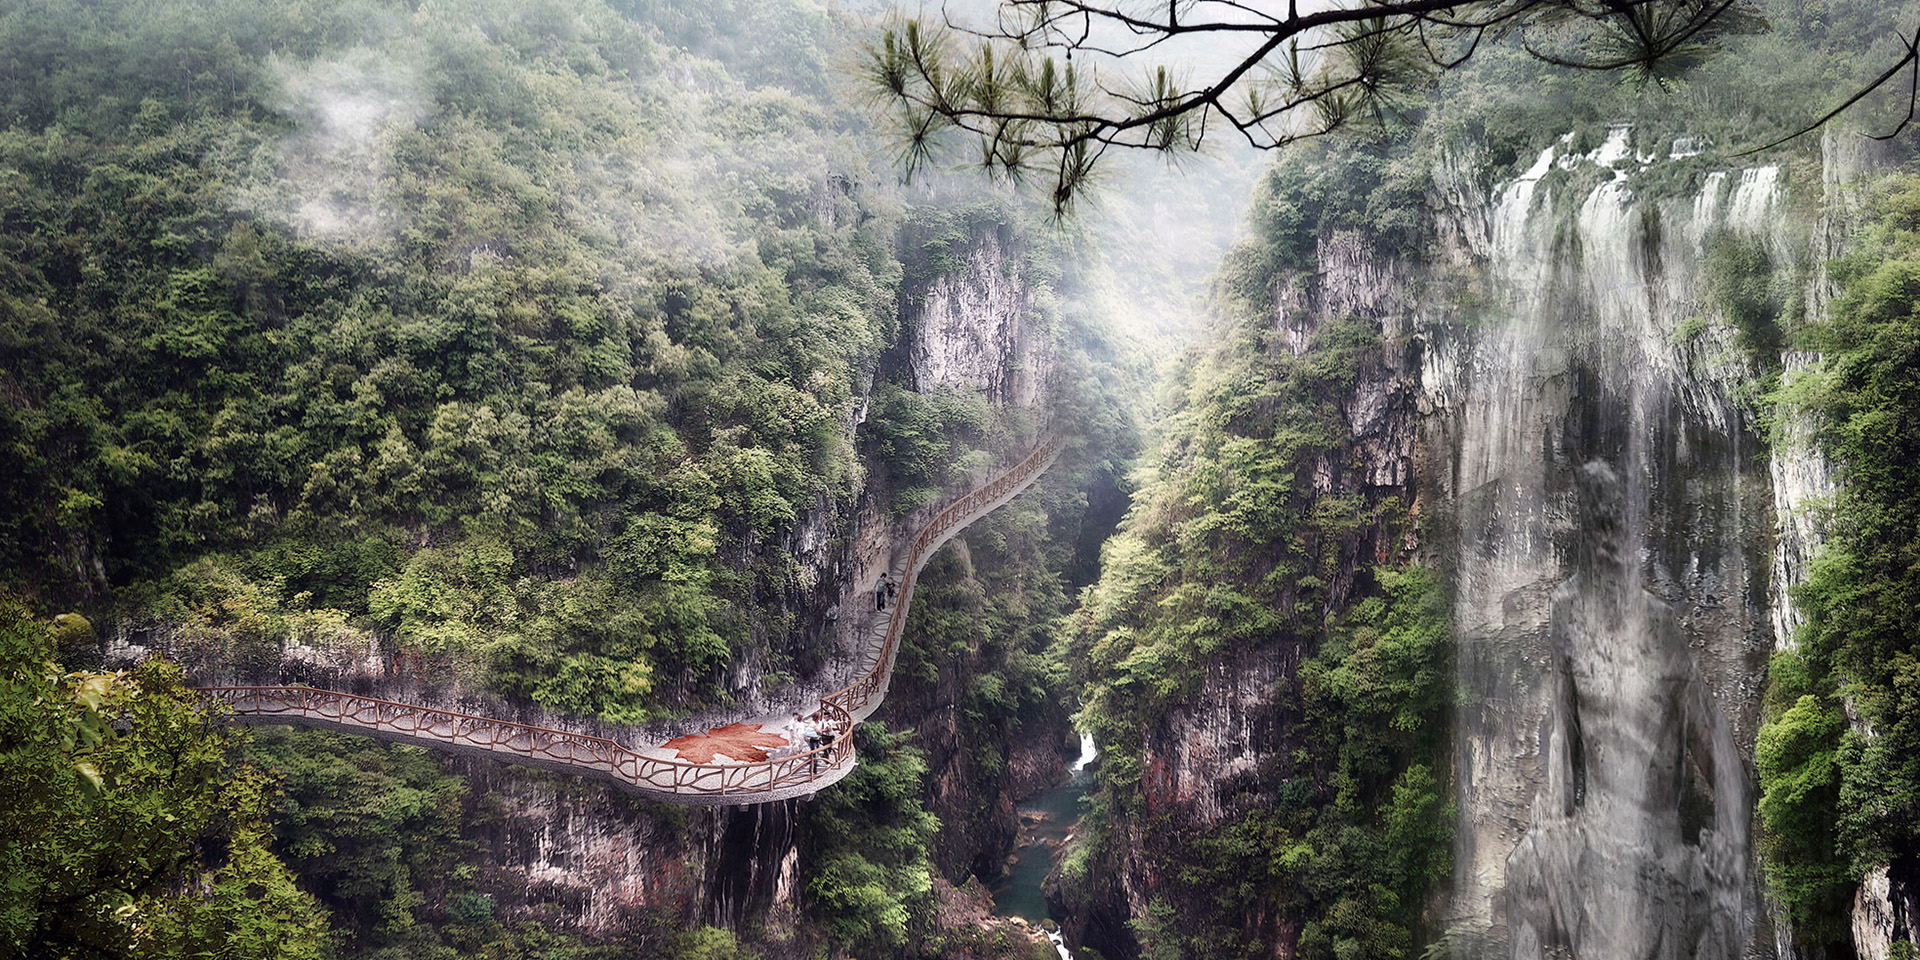 Huahuan Ancient Miaohe River Canyon Tourism Scenic Spot Design